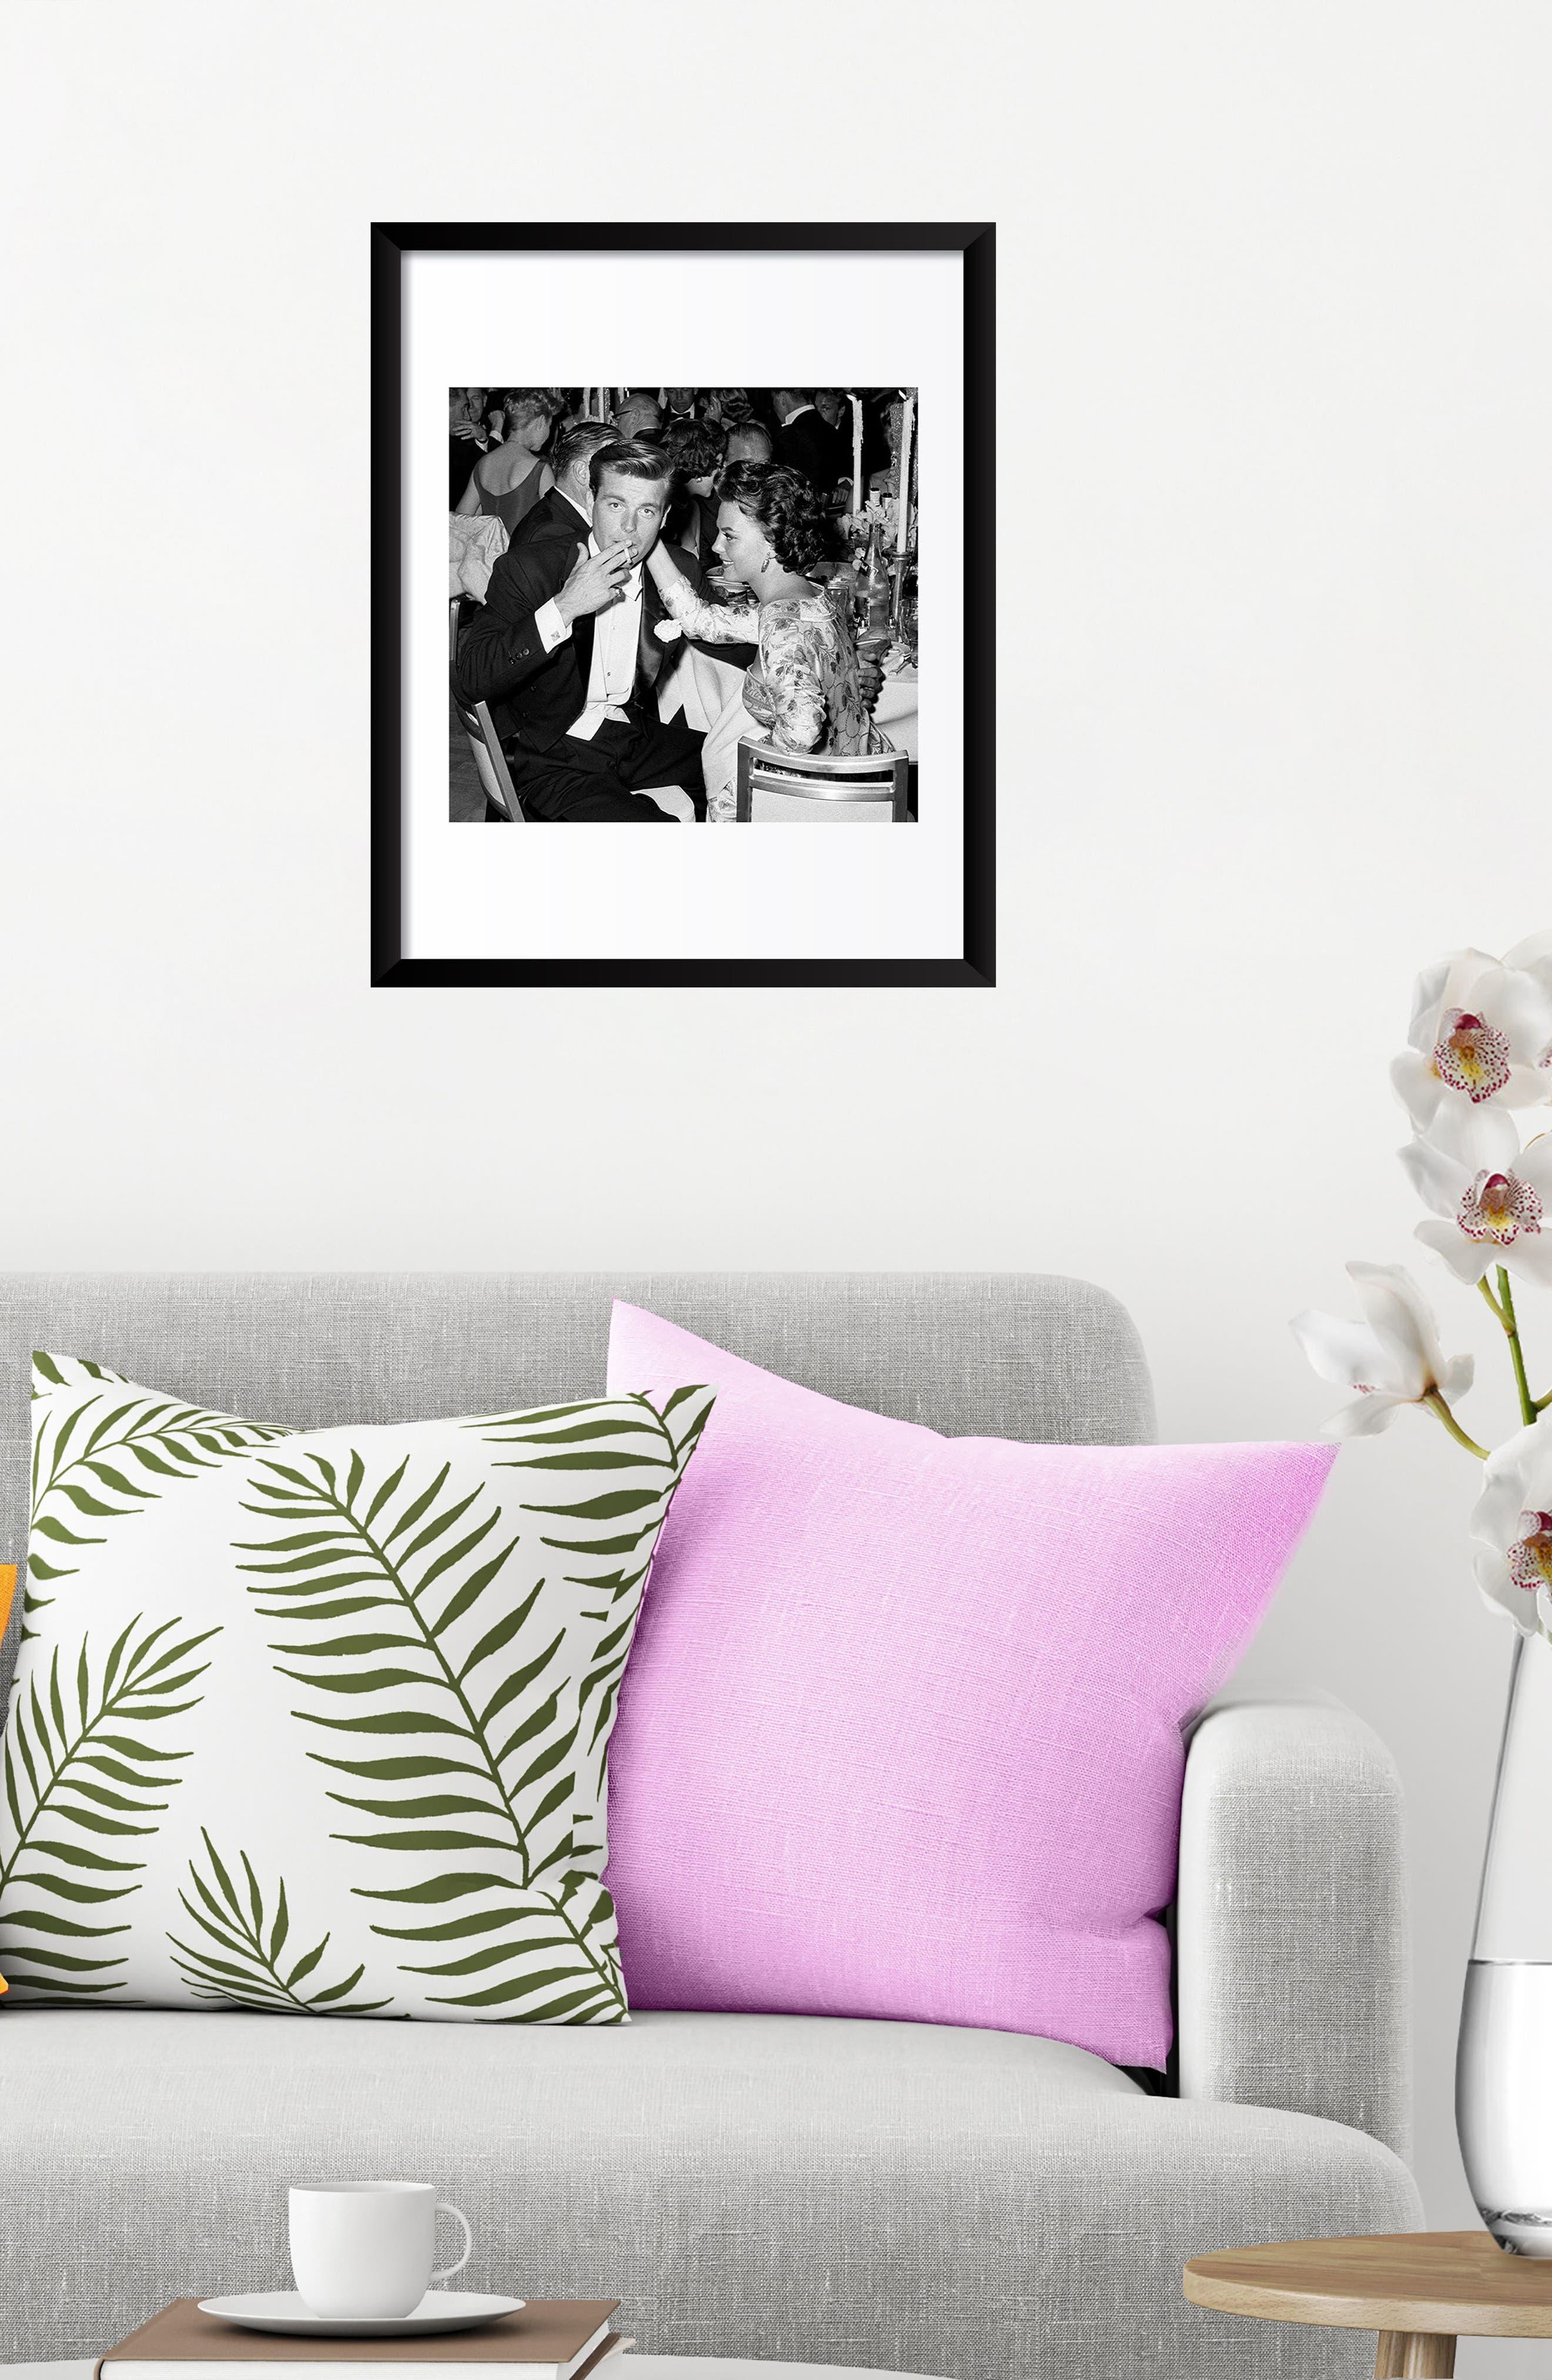 Robert Wagner & Natalie Wood Fine Art Print,                             Alternate thumbnail 3, color,                             001